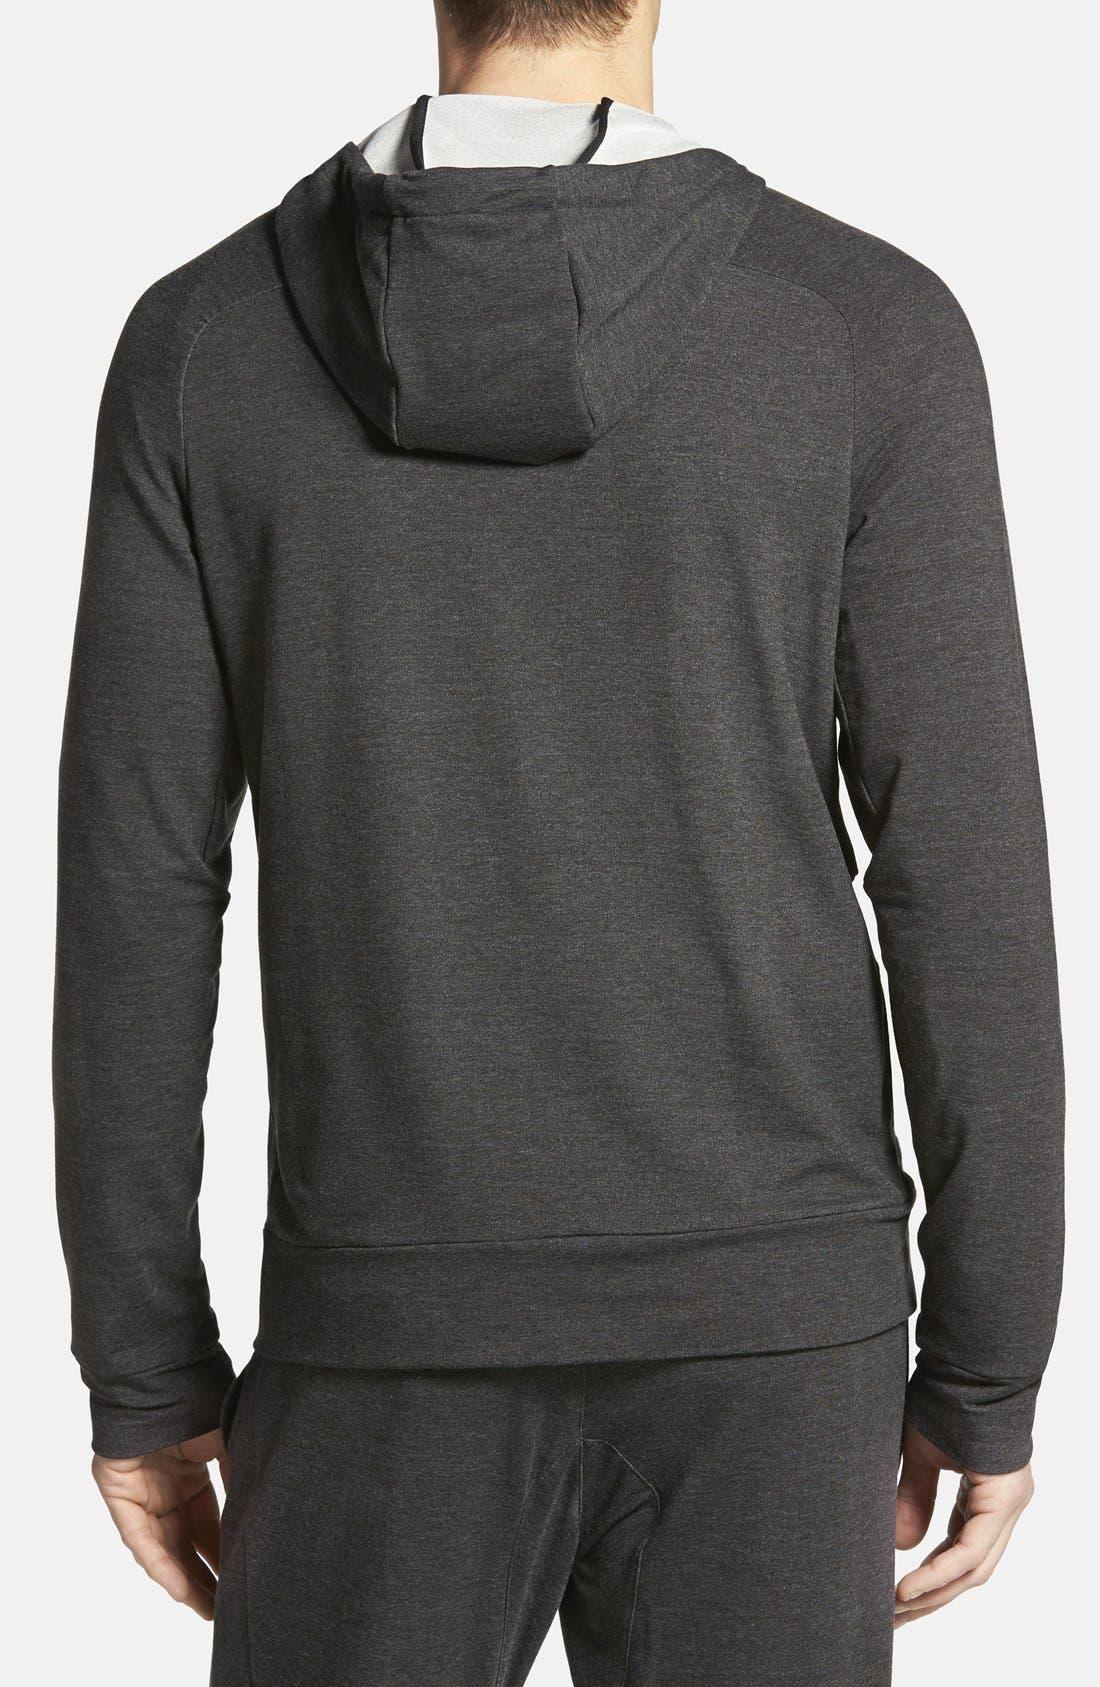 NIKE,                             Dri-FIT Touch Fleece Full Zip Hoodie,                             Alternate thumbnail 3, color,                             010